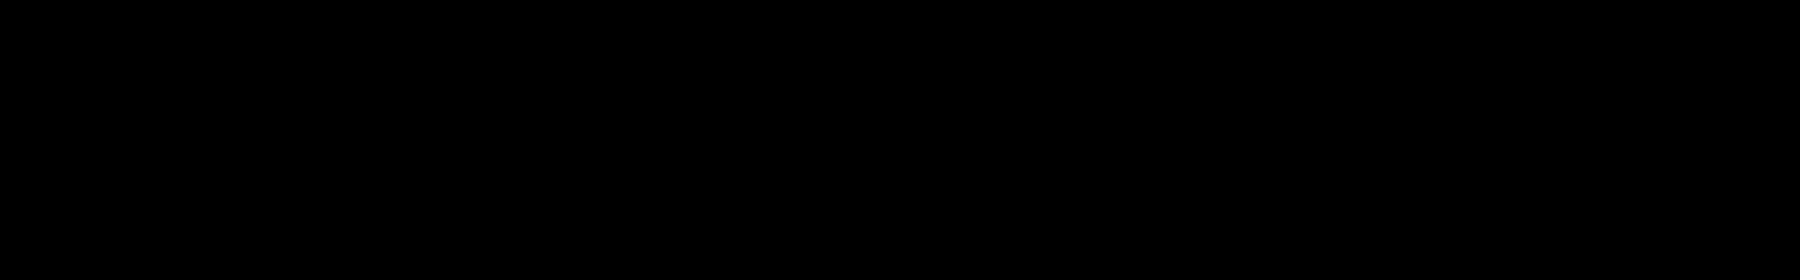 Lofi Pianos audio waveform